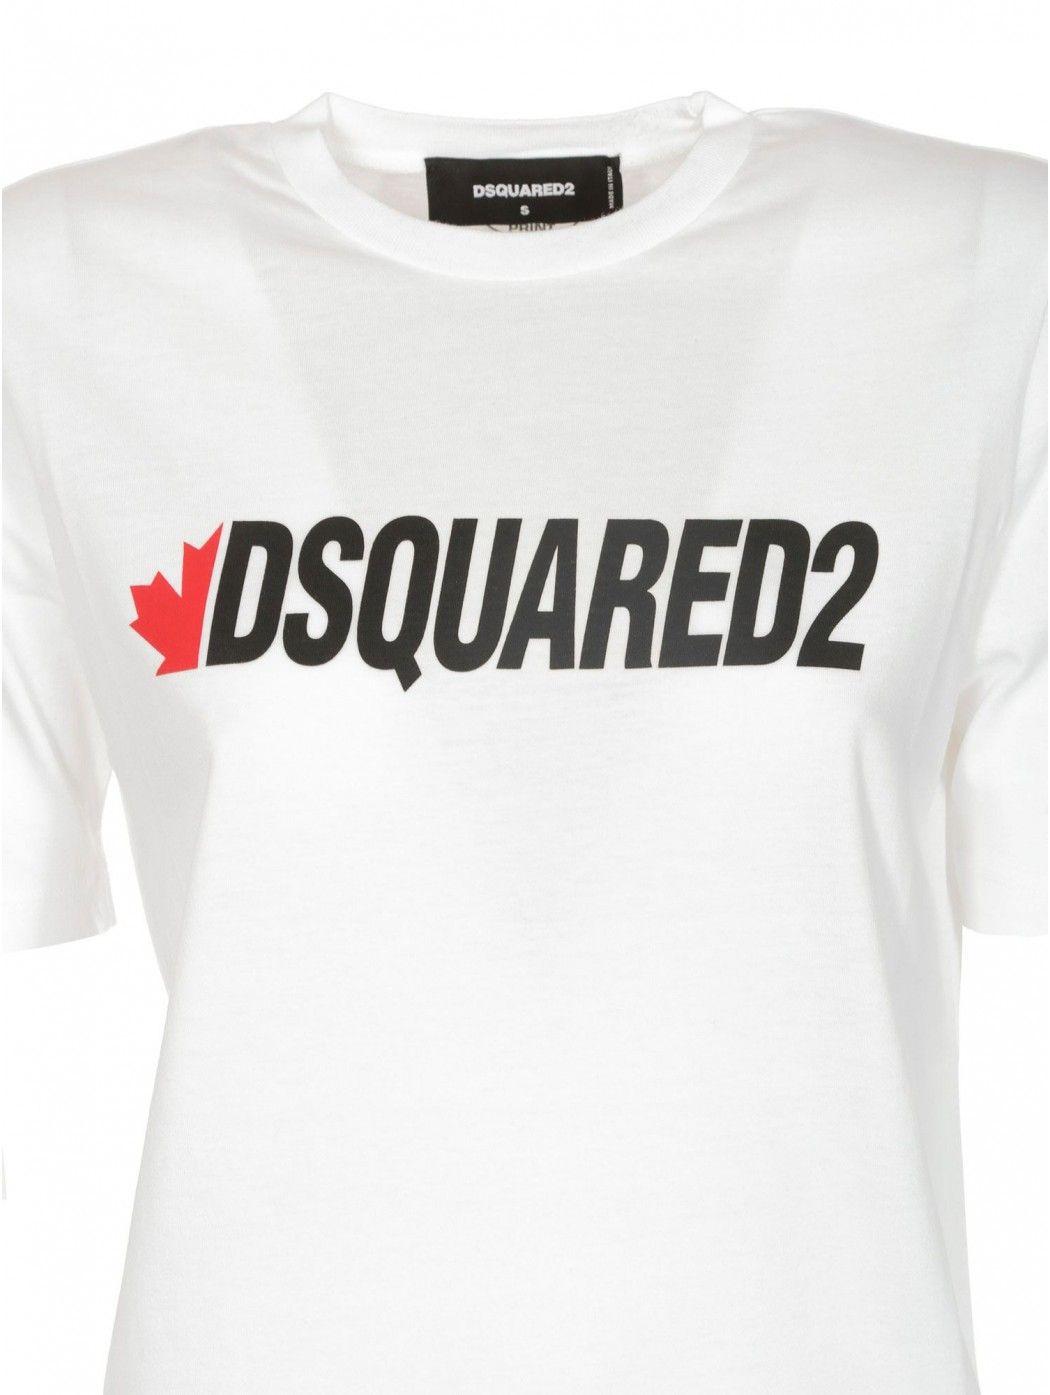 T-SHIRT DSQUARED2 S75GD0180S21600 100